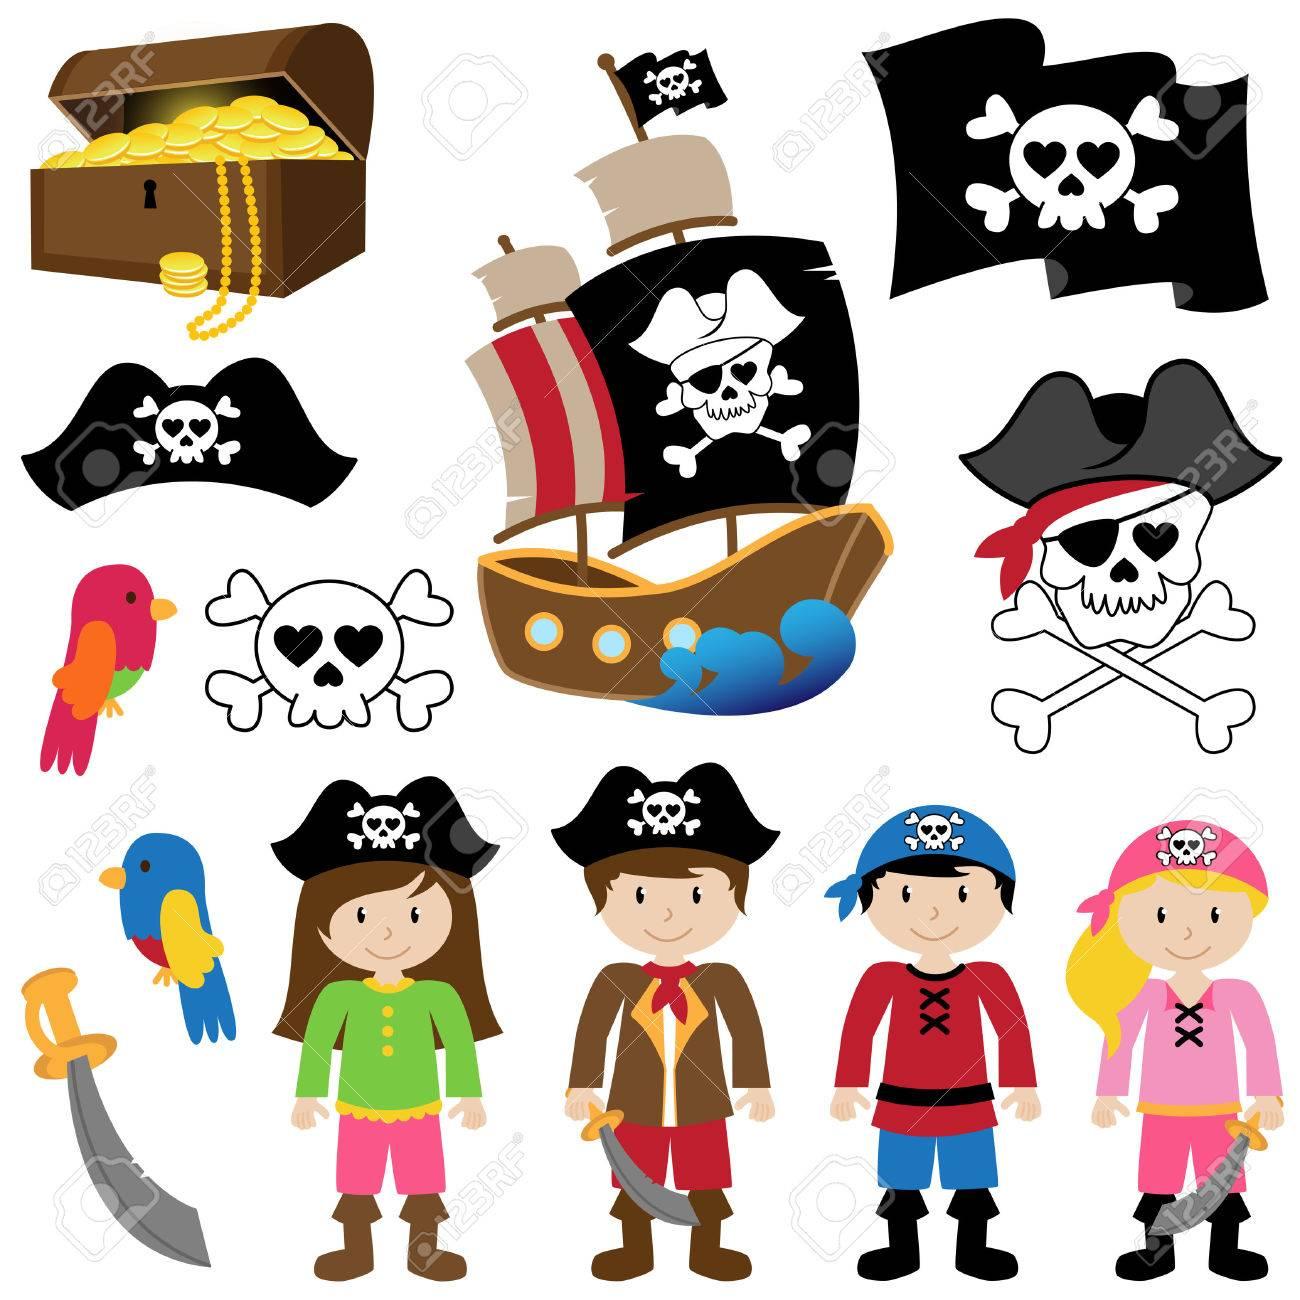 Vector Illustration of Pirates - 29966332